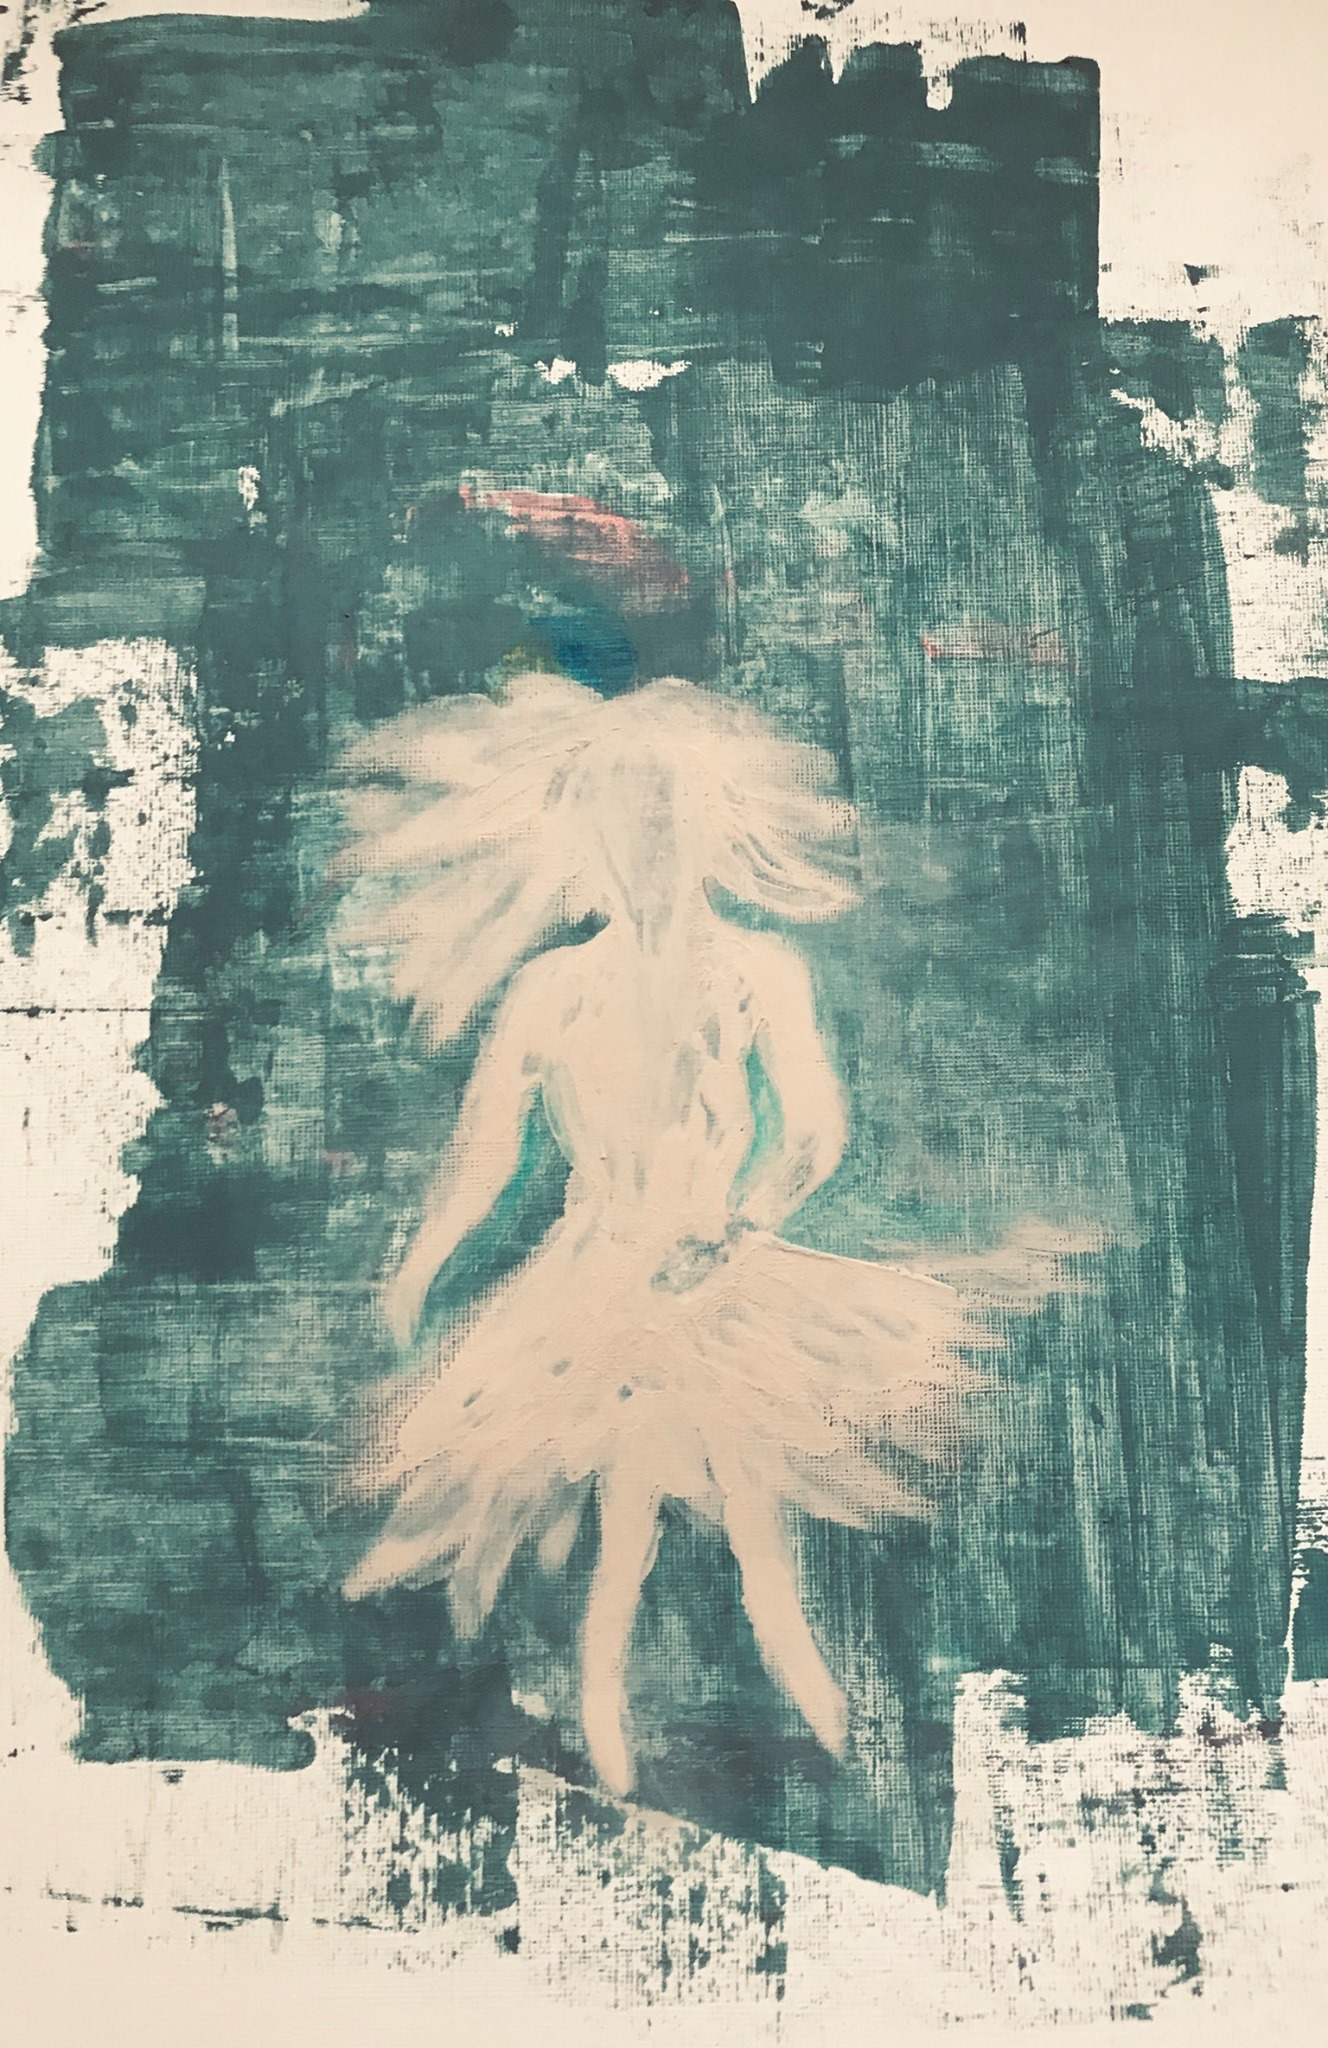 Tänzerin, mixed media auf Papier